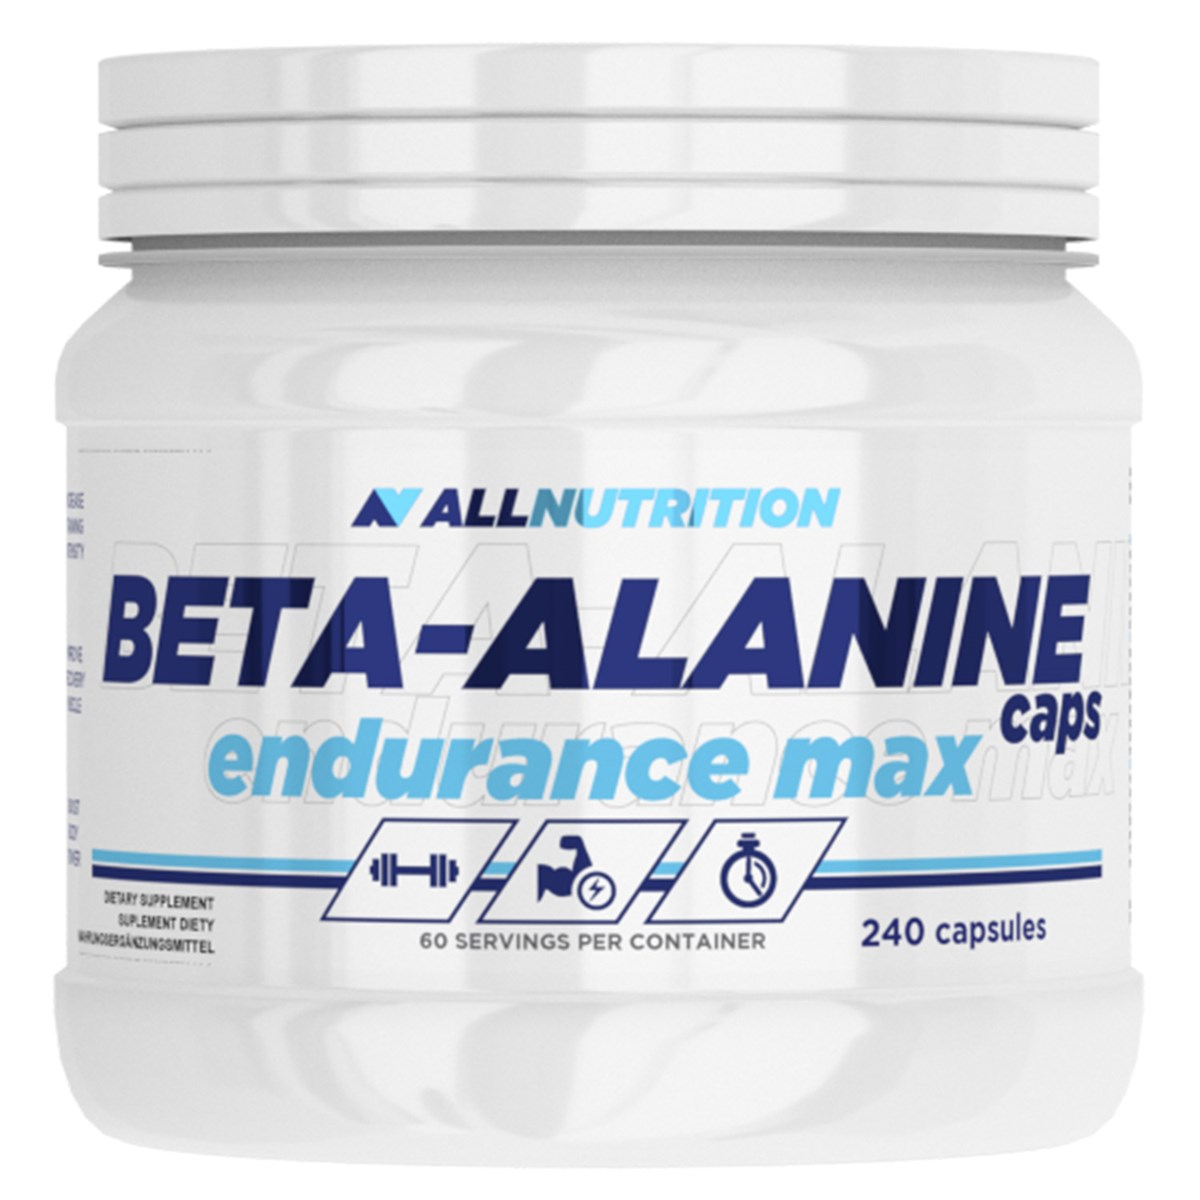 Beta-Alanine Endurance Max